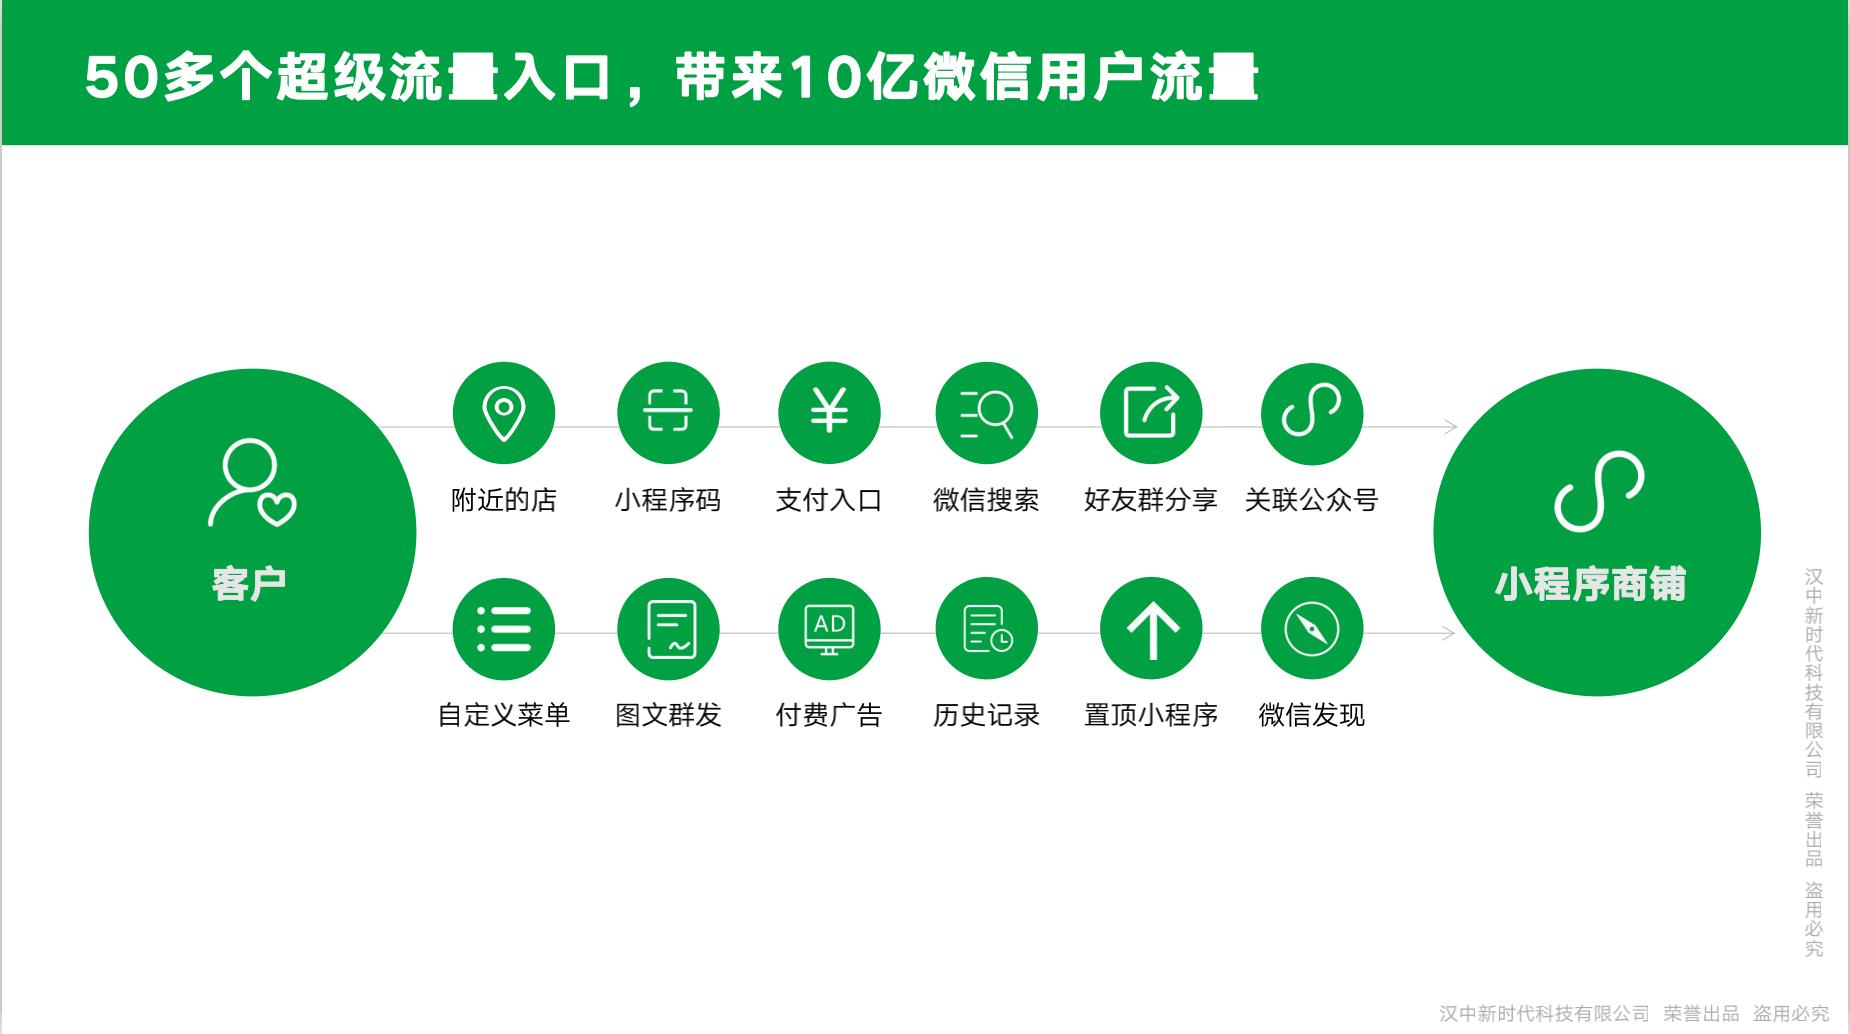 E-SHOP社交电商米乐app官网小程序解决方案